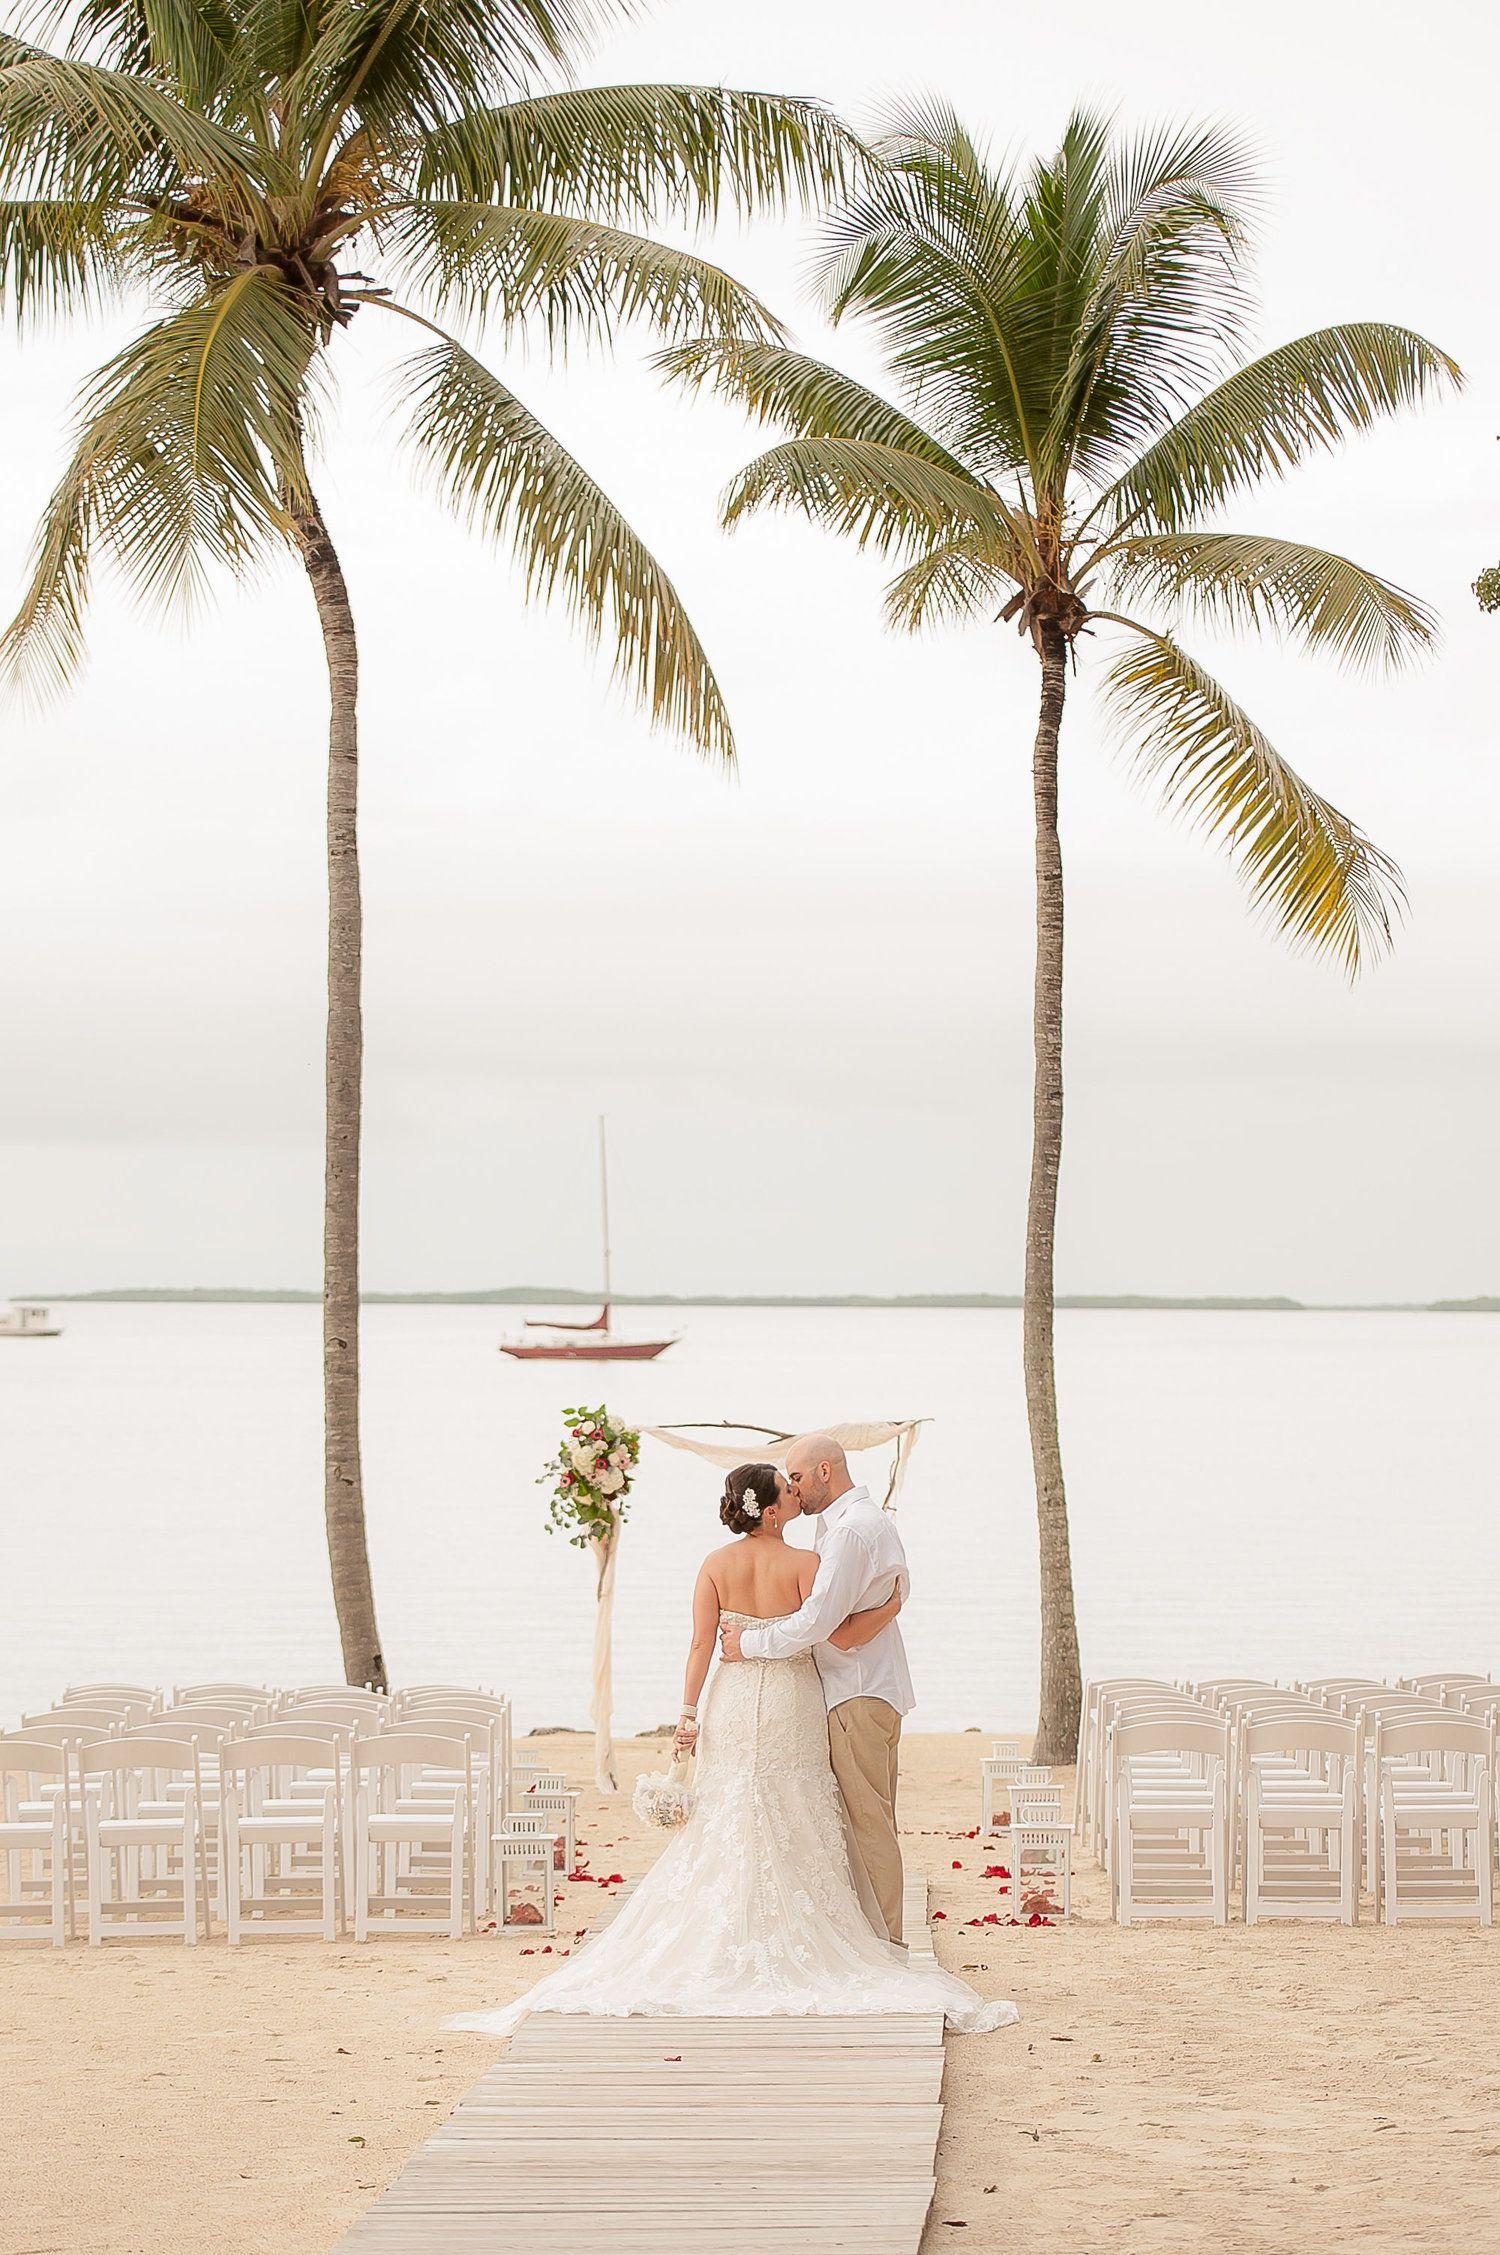 Florida Keys Wedding Photo Key Largo Lighthouse Beach Weddings Jannette De Llanos Key Largo Lighthouse Beach Wedding Attire Florida Beach Wedding